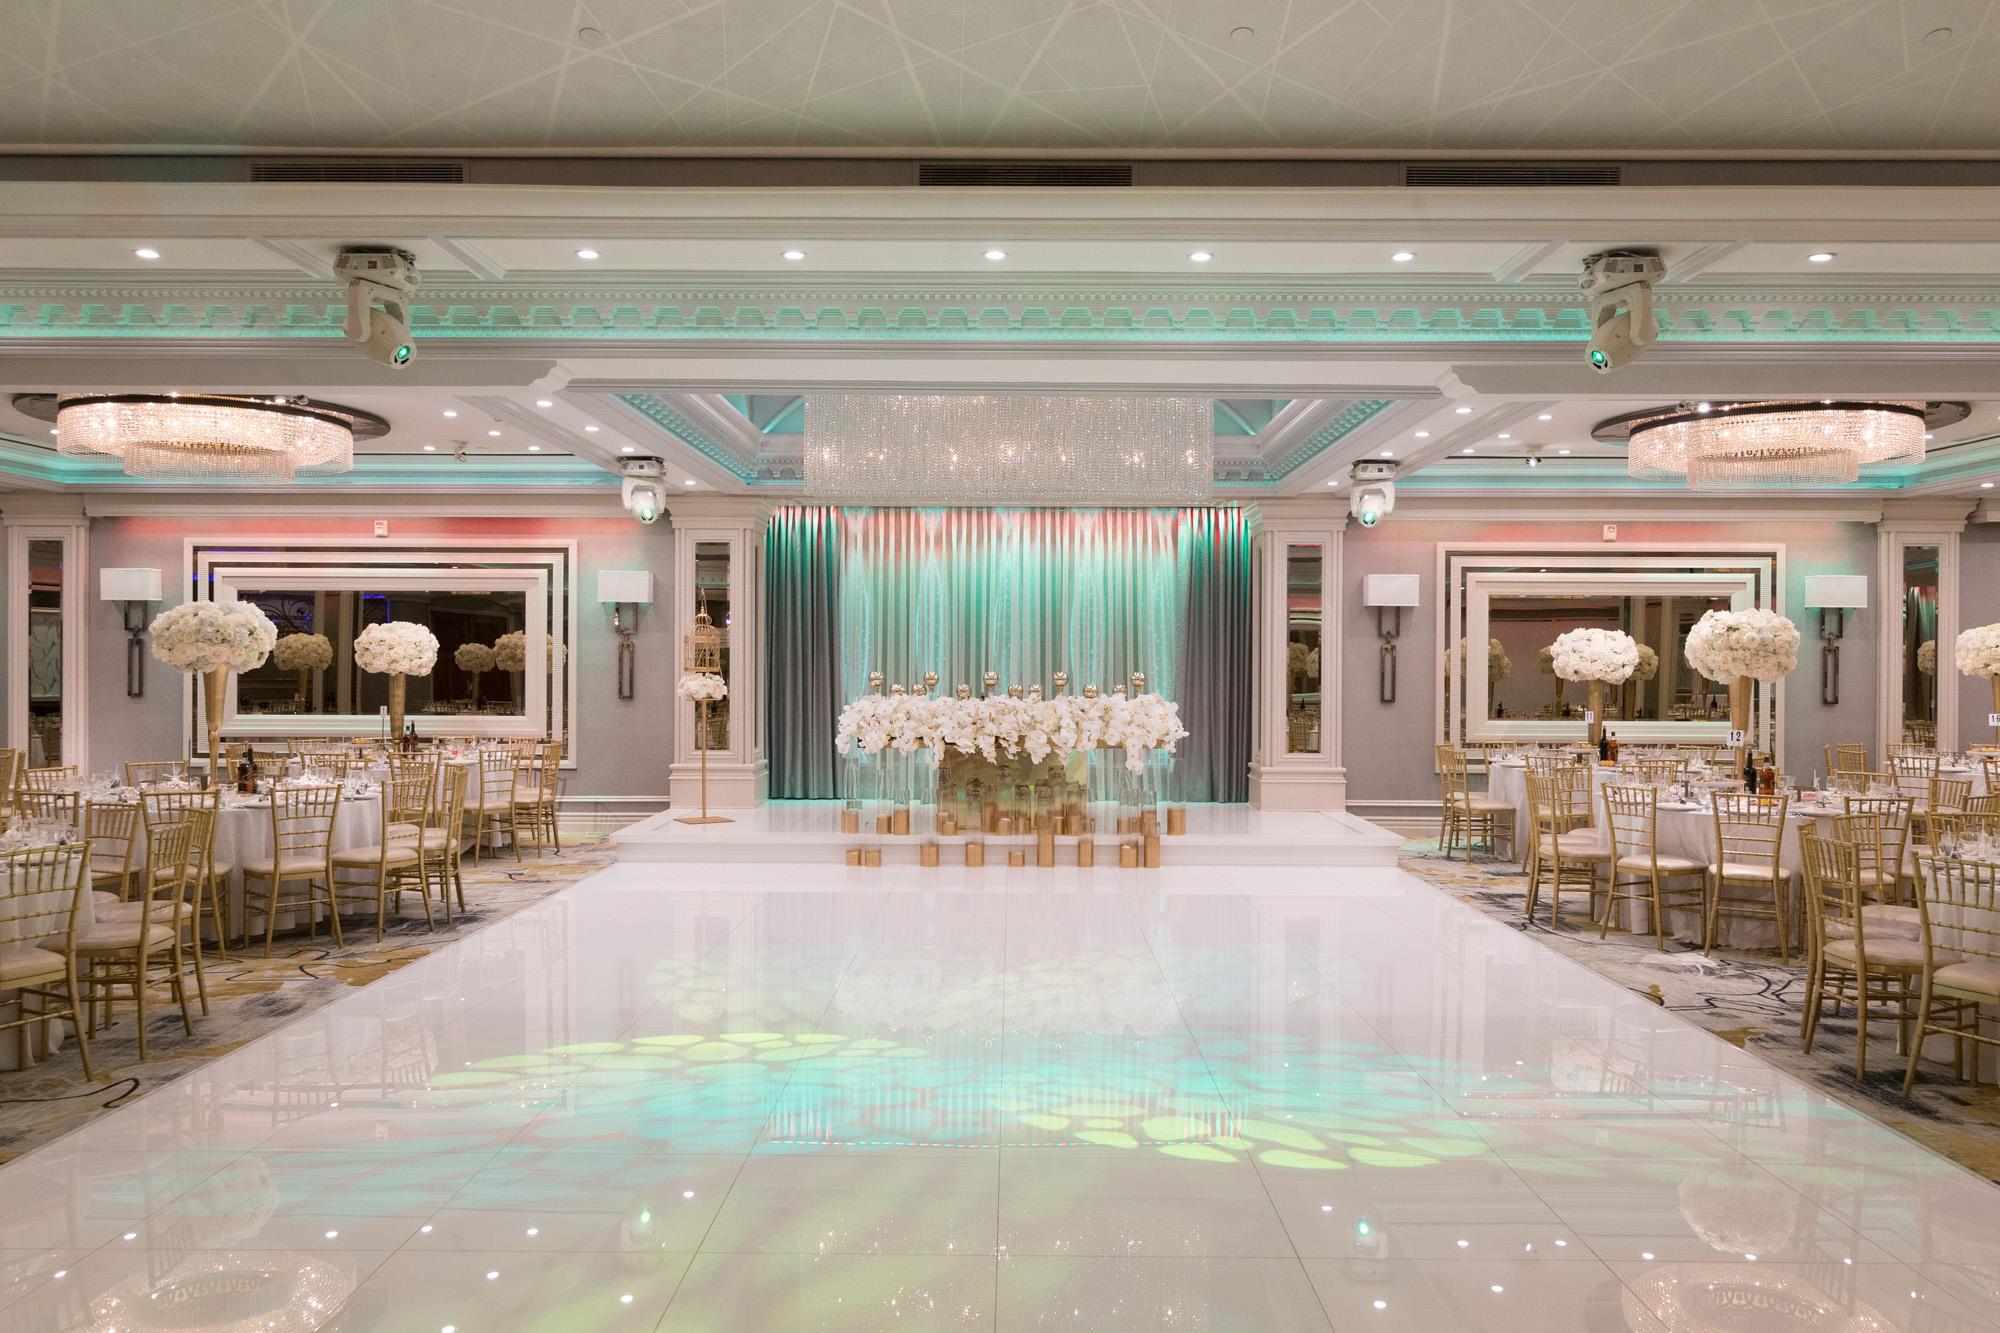 Contemporary Event & Wedding Venues in Glendale, CA ...